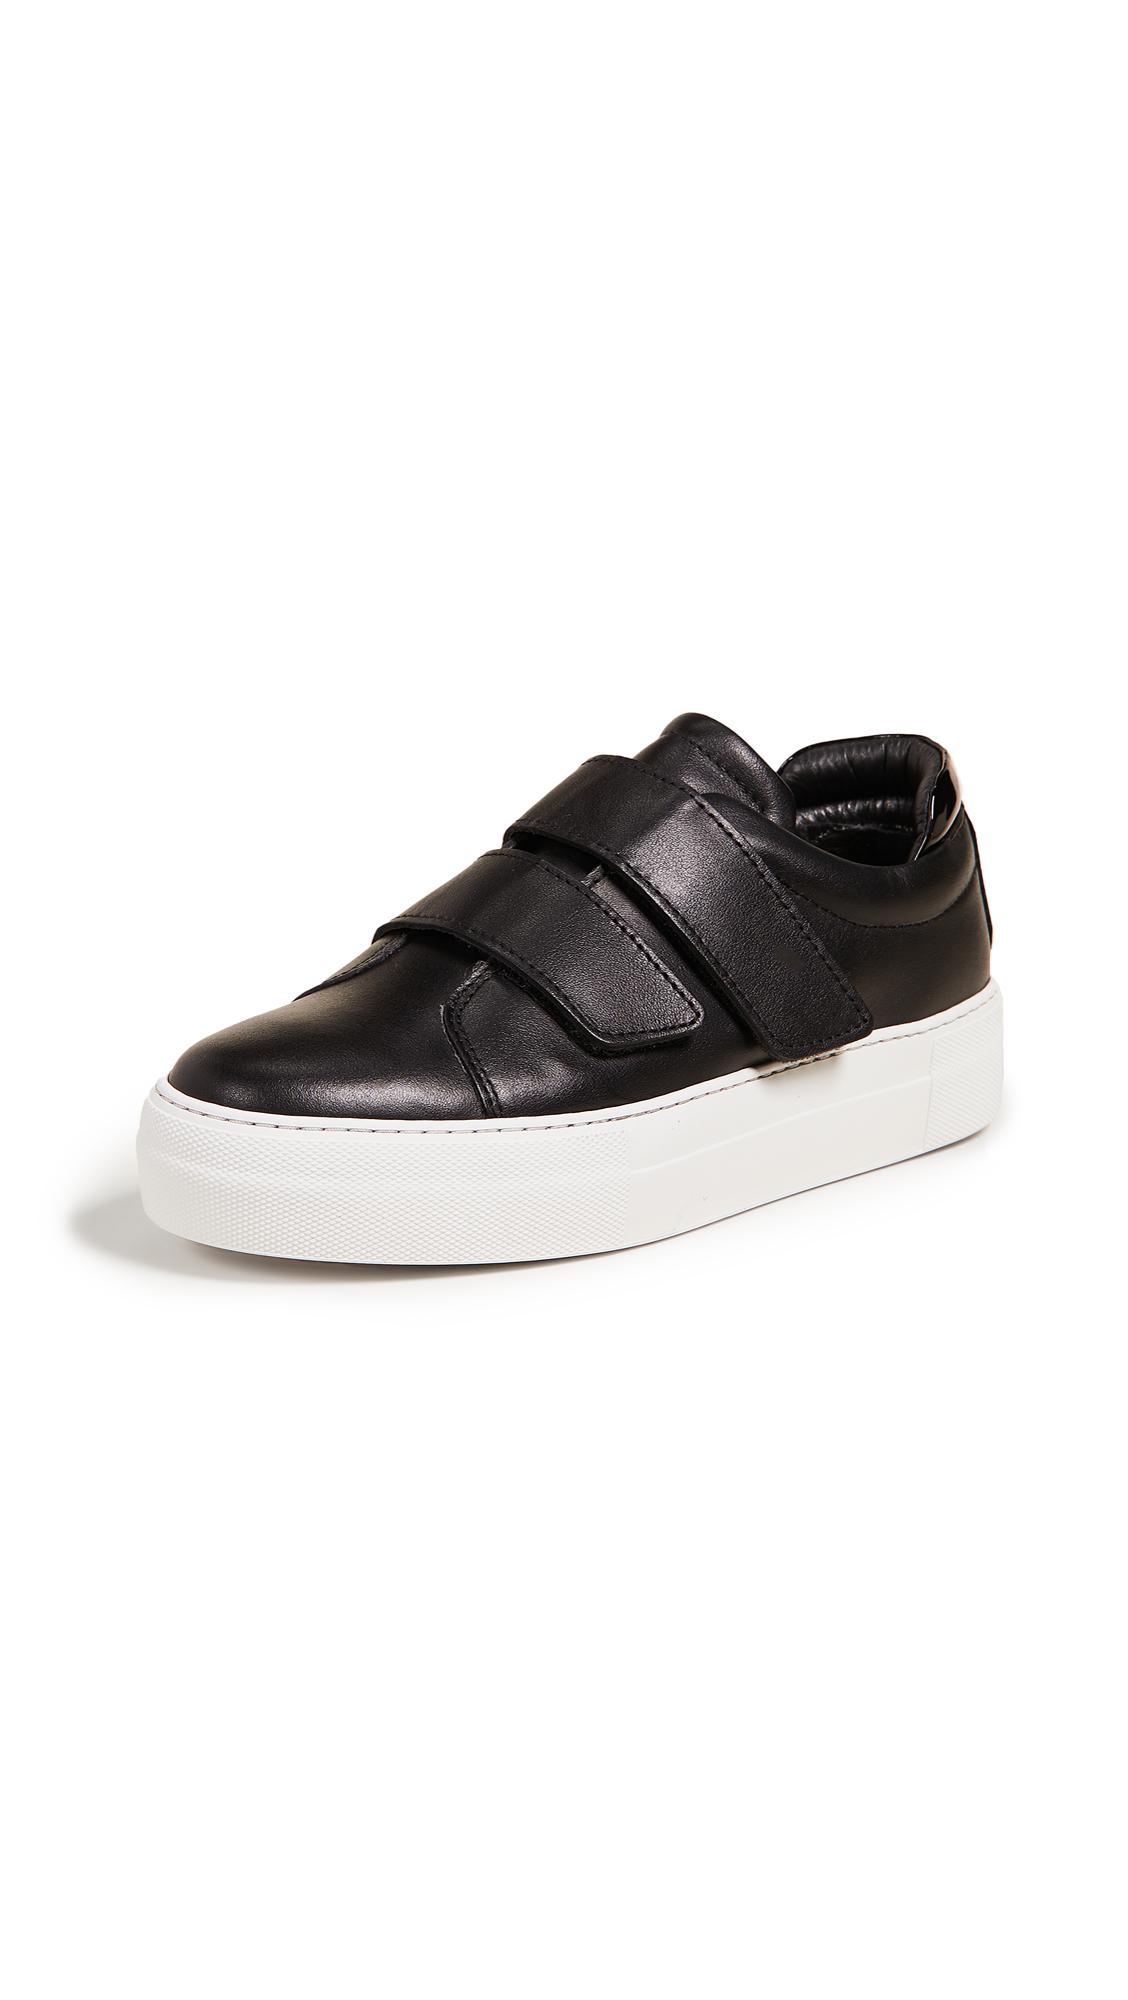 WANT Les Essentiels Lalibela Velcro Strap Sneakers - Black